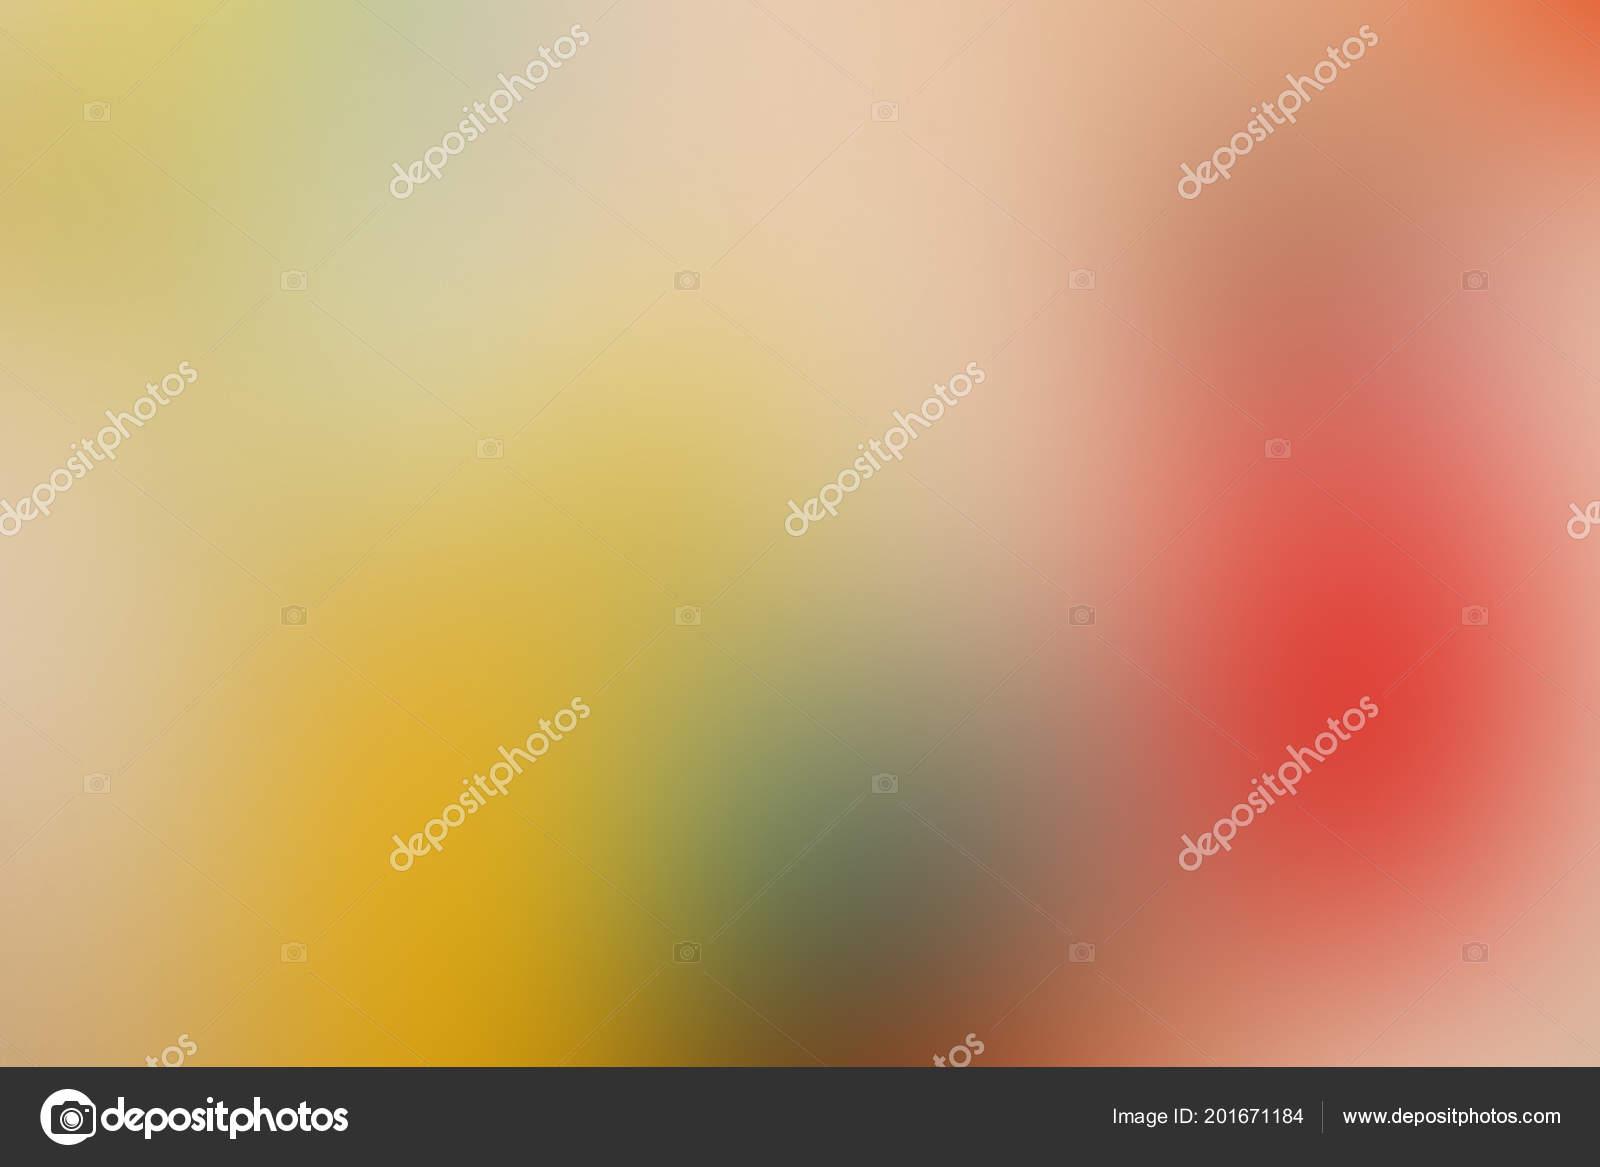 depositphotos 201671184 stock photo gradient background rainbow multicolored rainbow